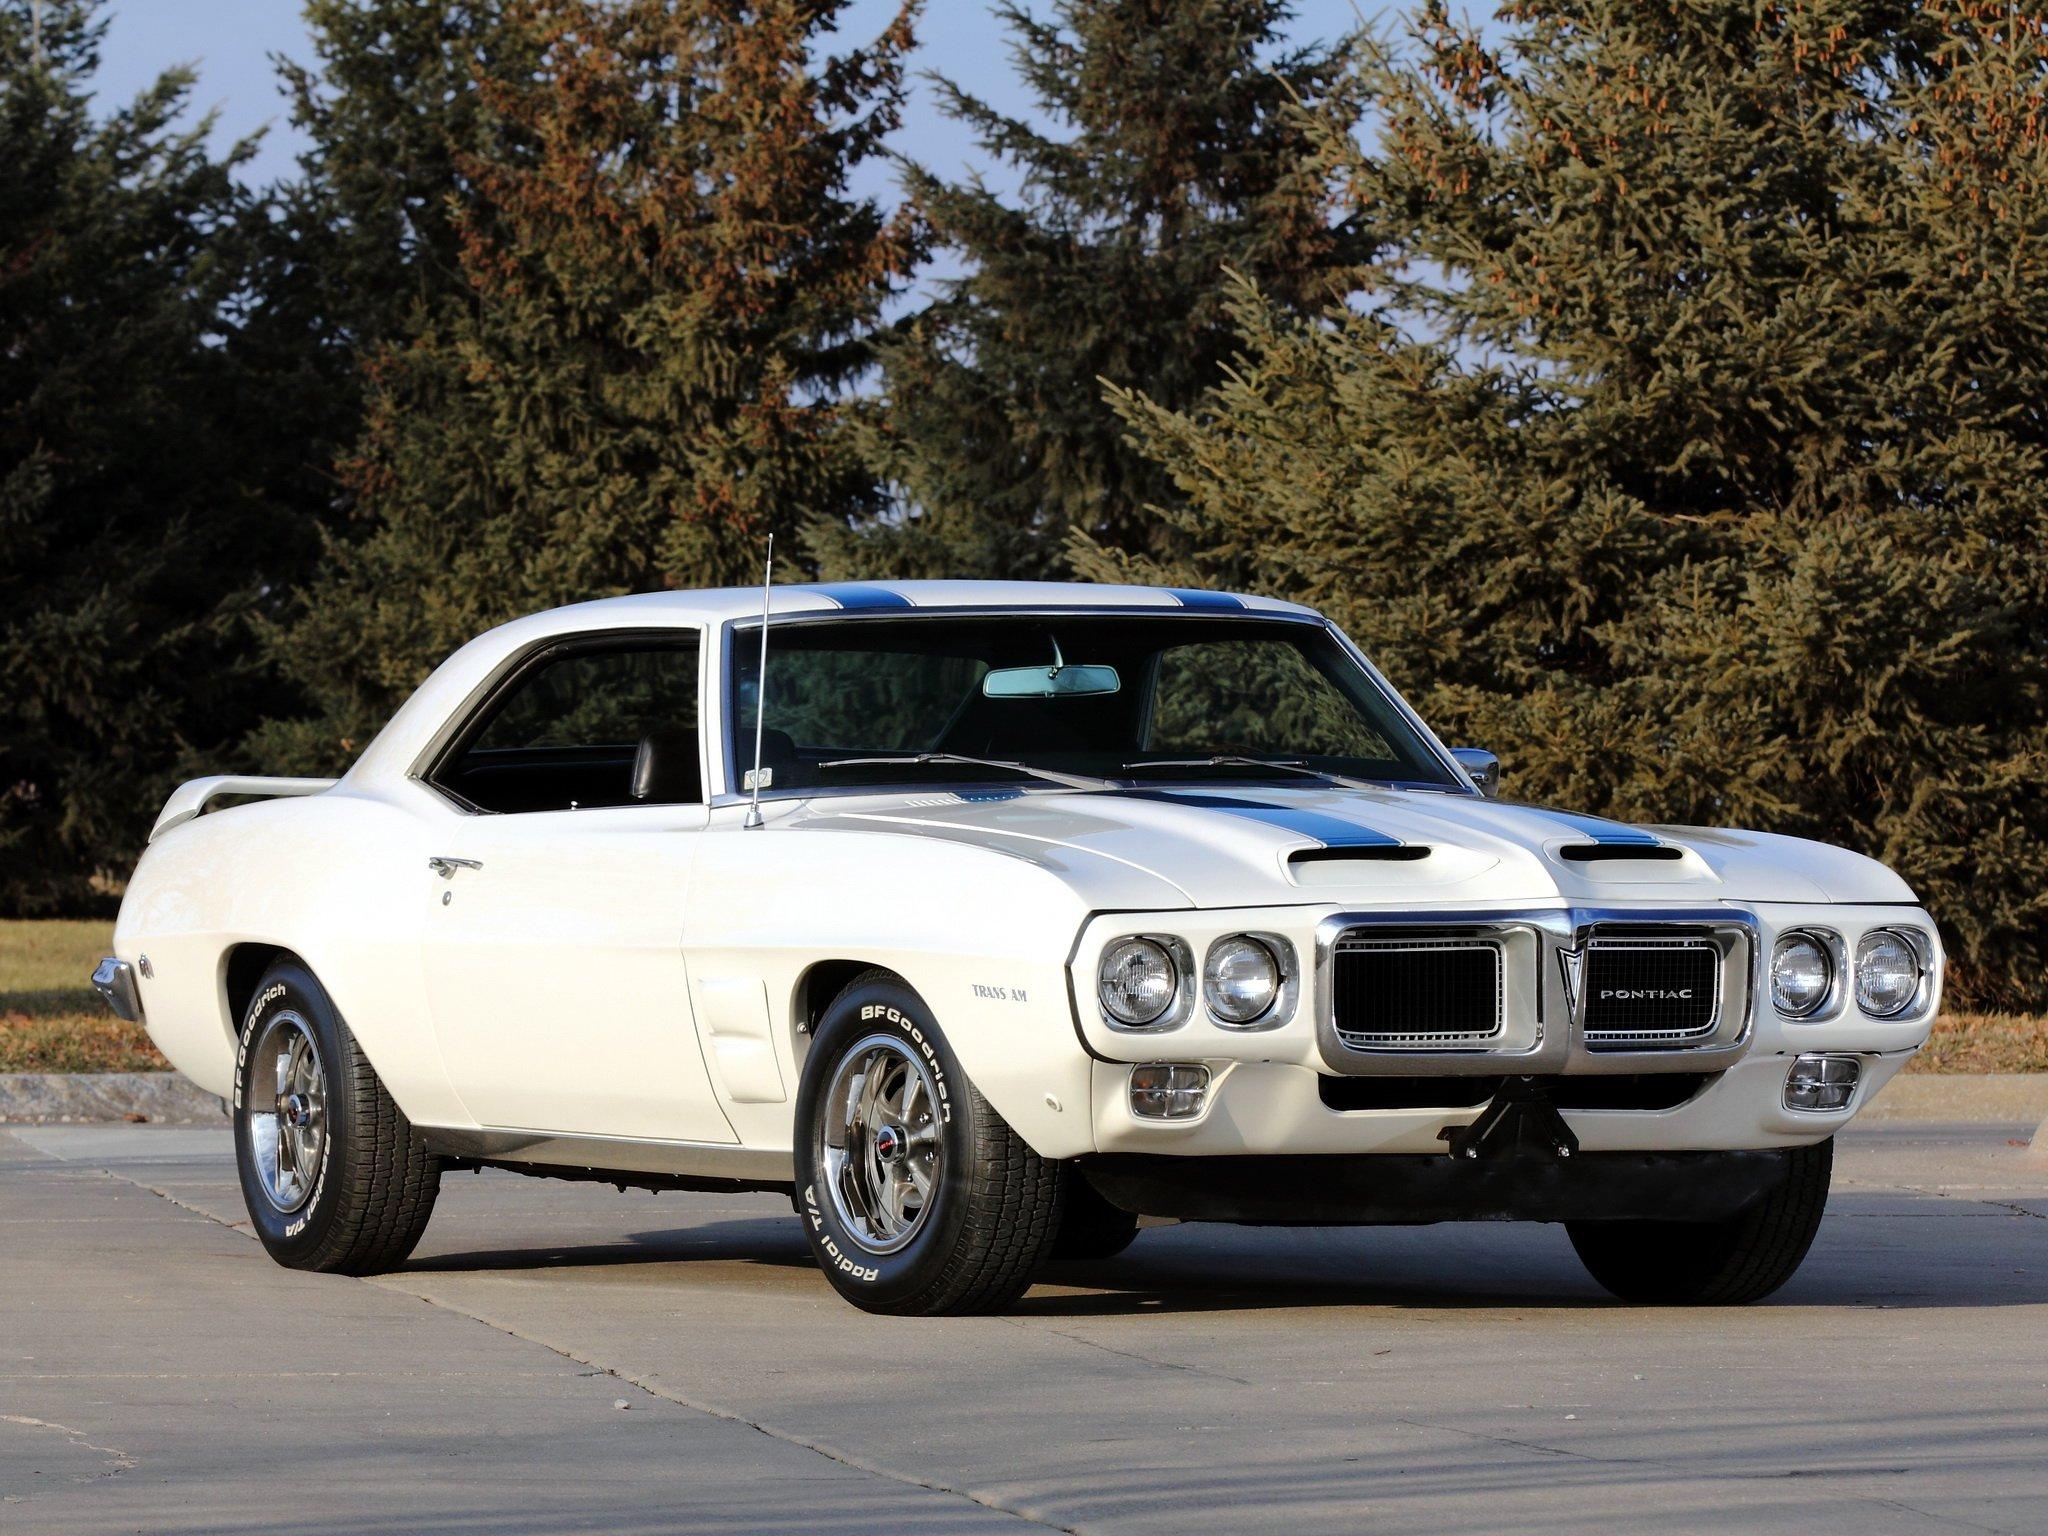 DiecastSociety • View topic ACME New 1968 Pontiac Firebird